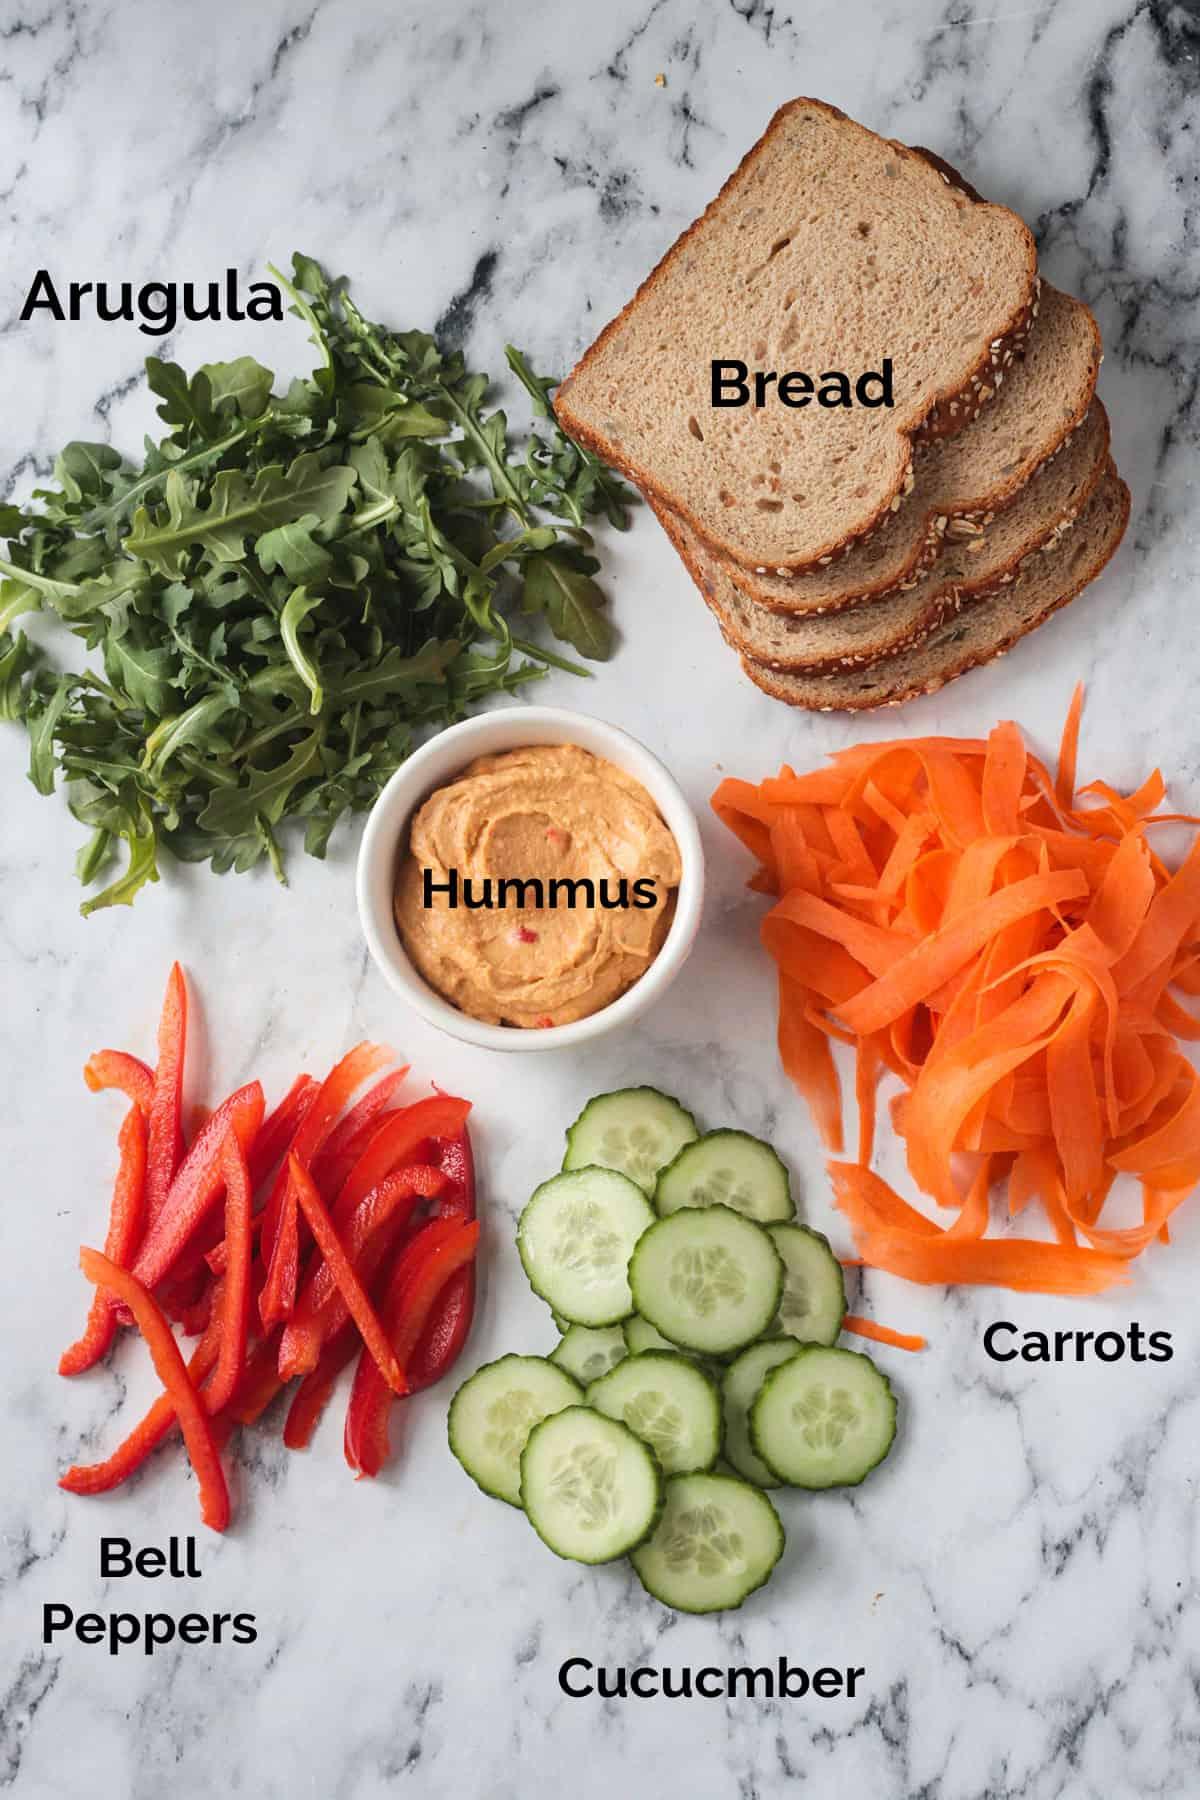 Recipe ingredients arrayed in individual bowls